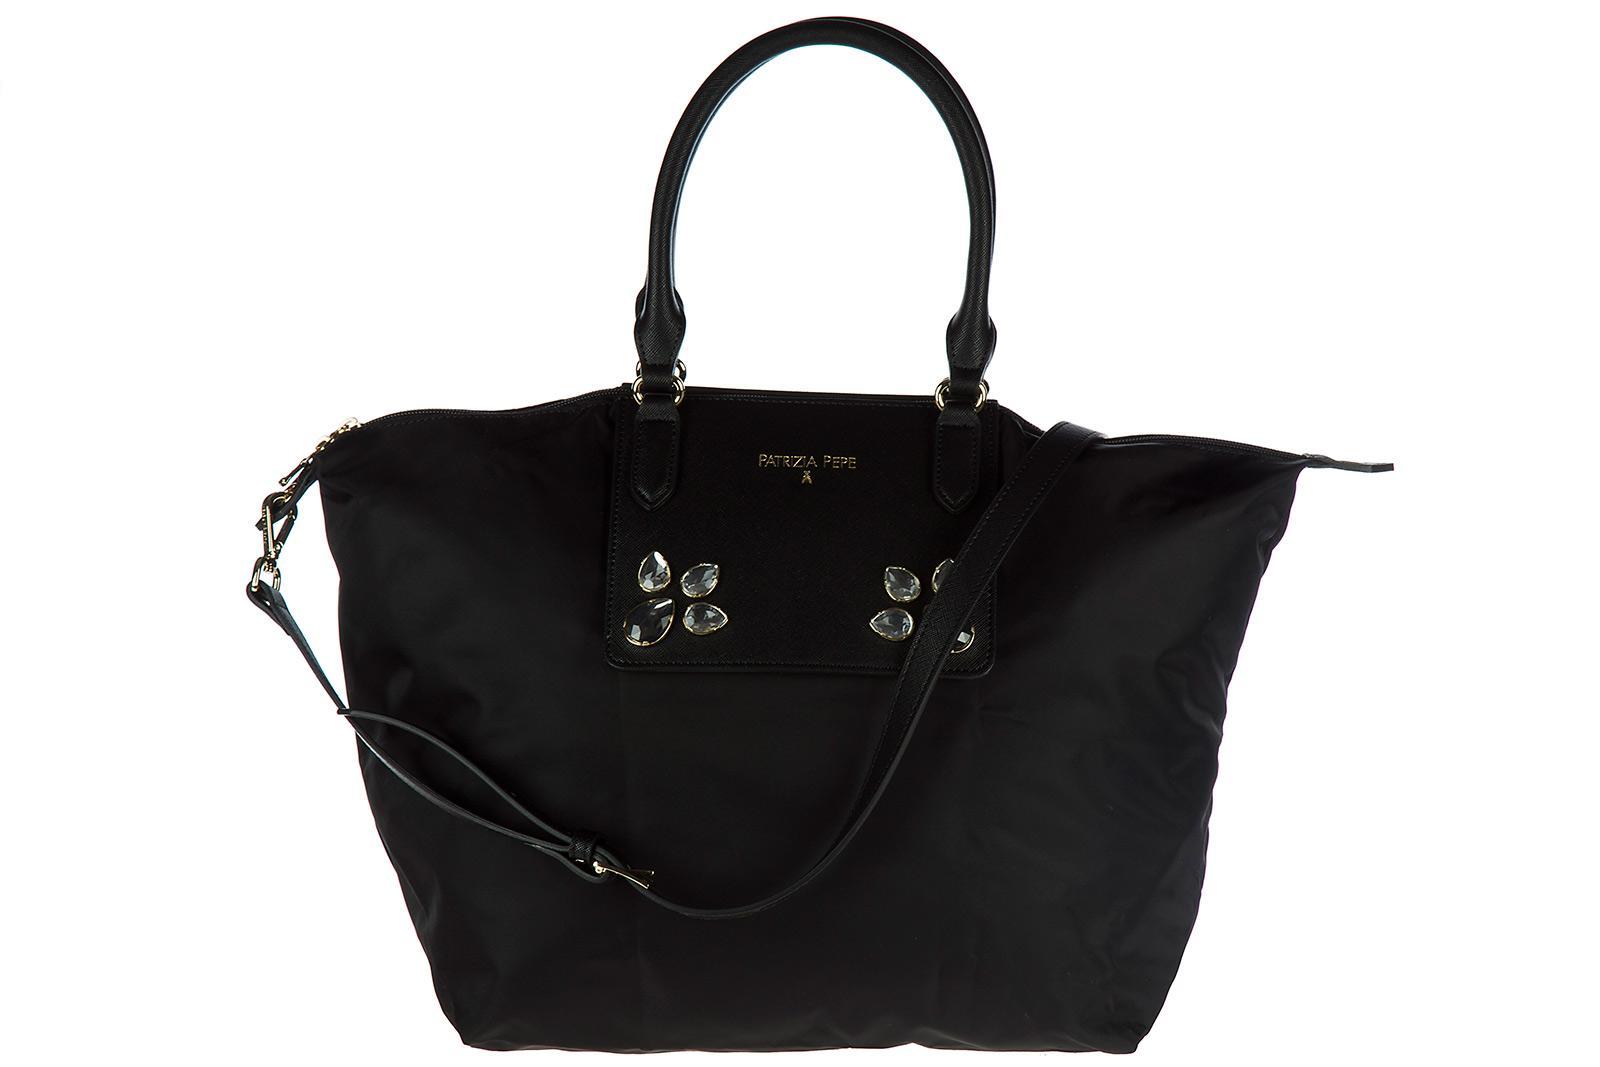 Handtasche Damen Tasche Damenhandtasche Bag In Black